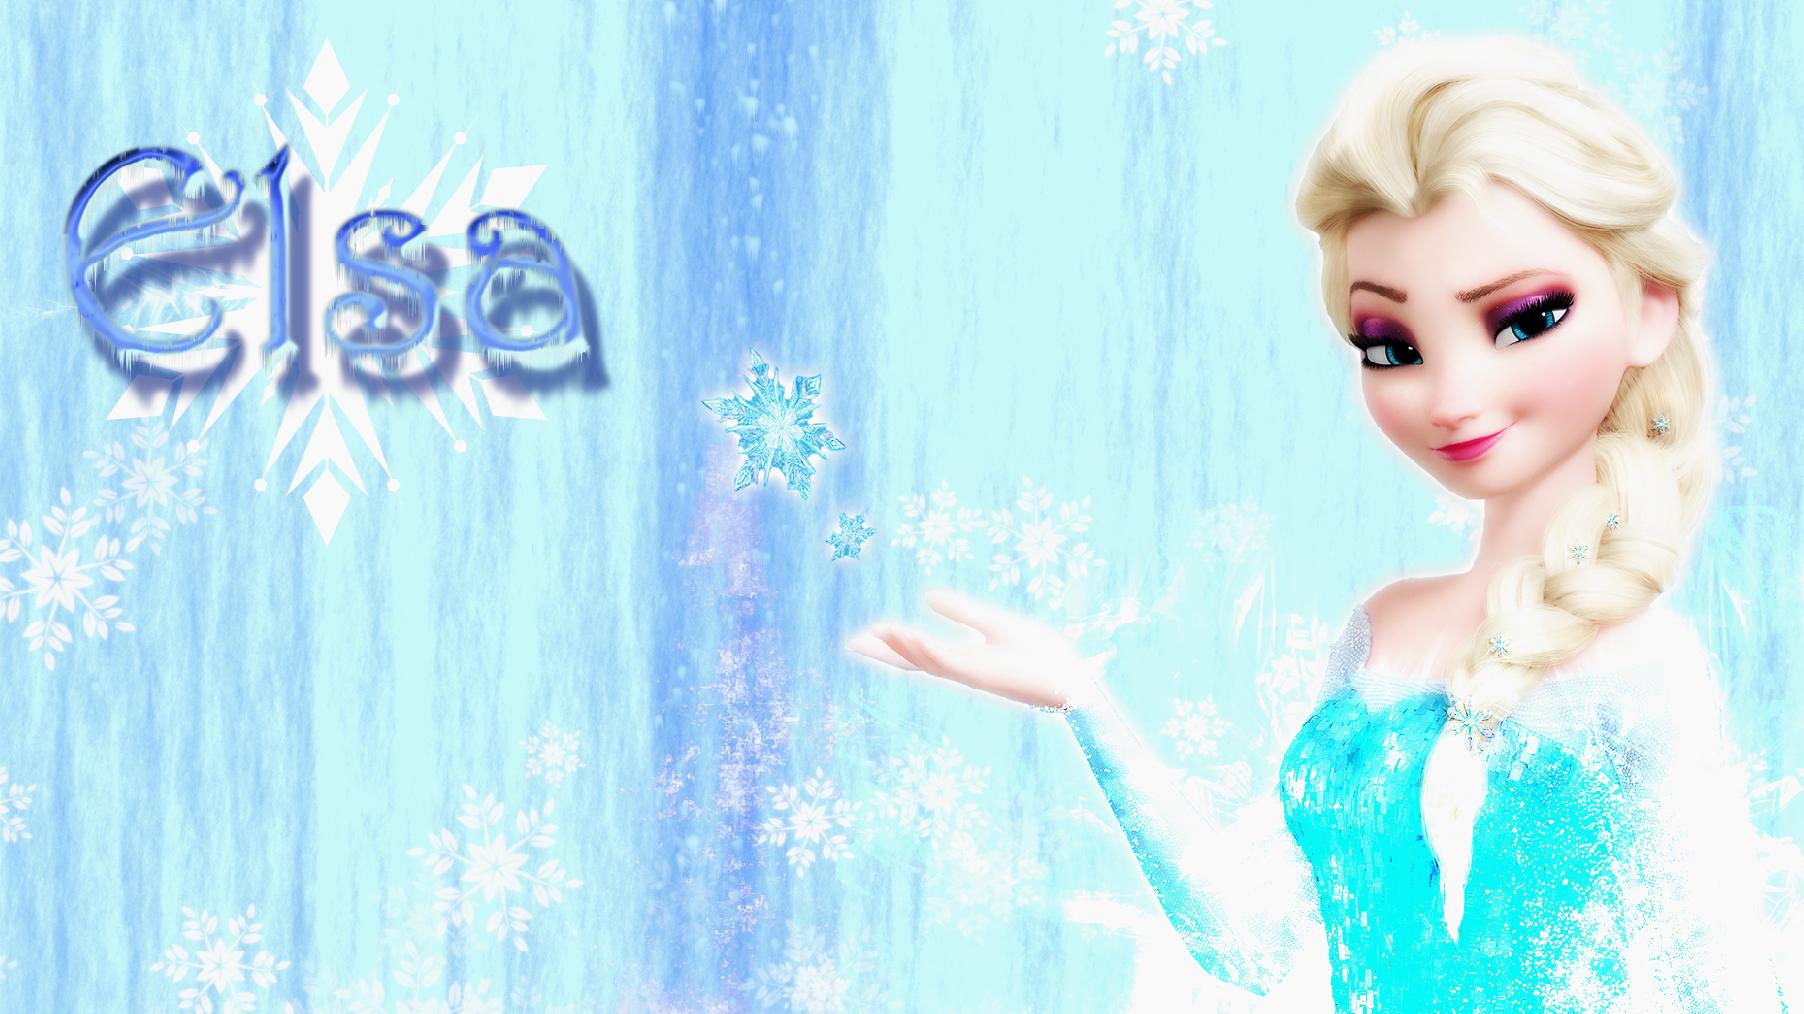 Frozen Elsa Wallpaper - WallpaperSafari